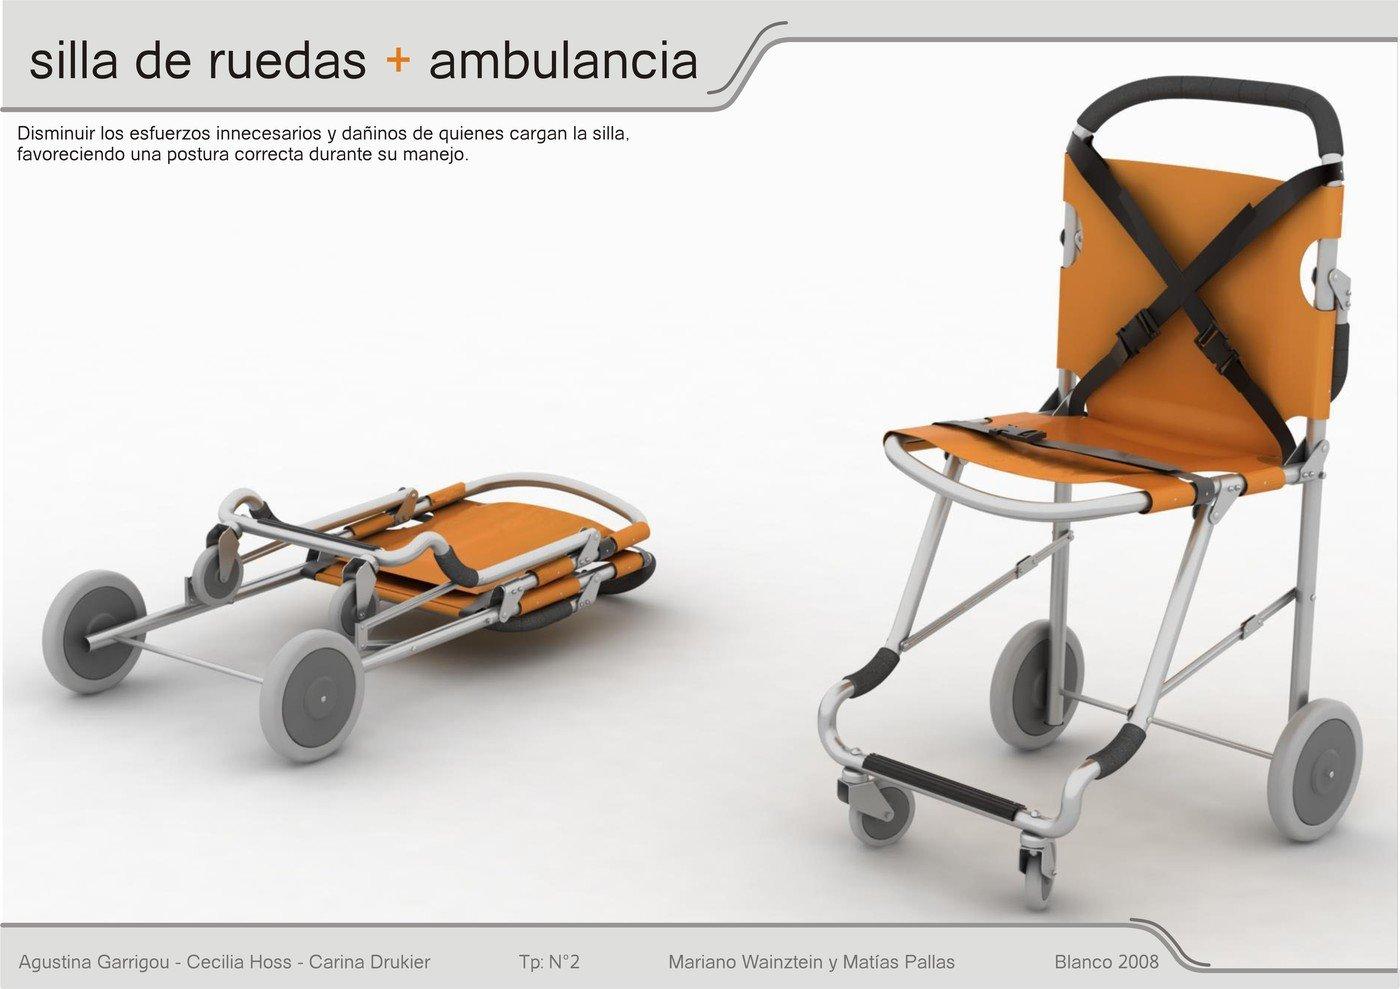 Agustina De By Garrigou Ambulancia Silla Ruedas At Para oWrdeCBQx